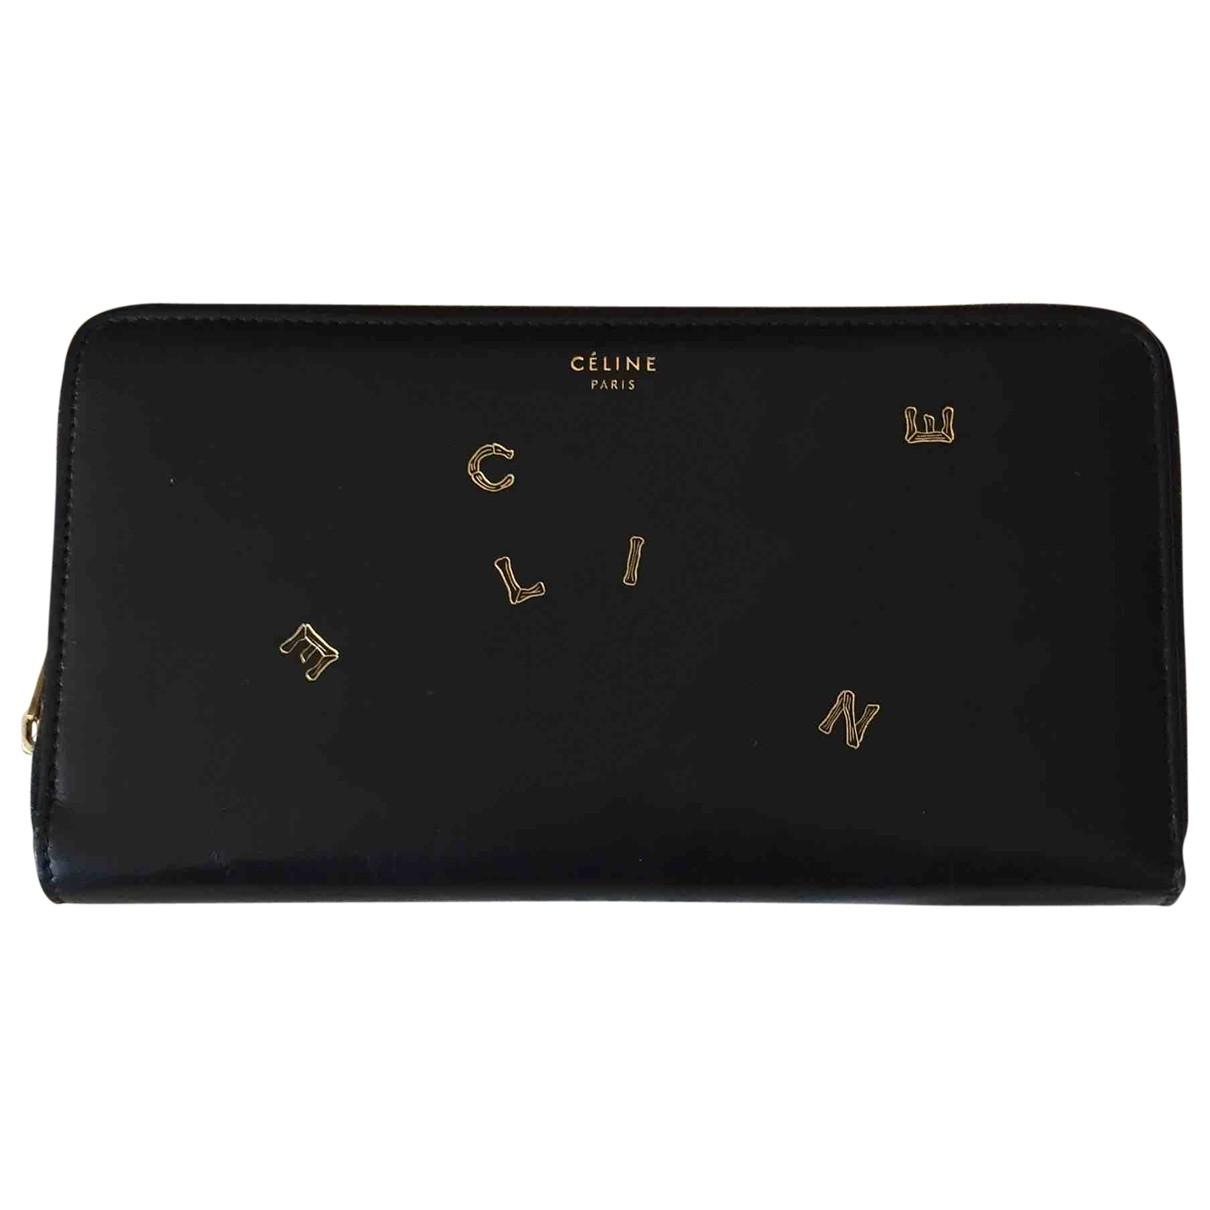 Celine \N Black Leather wallet for Women \N